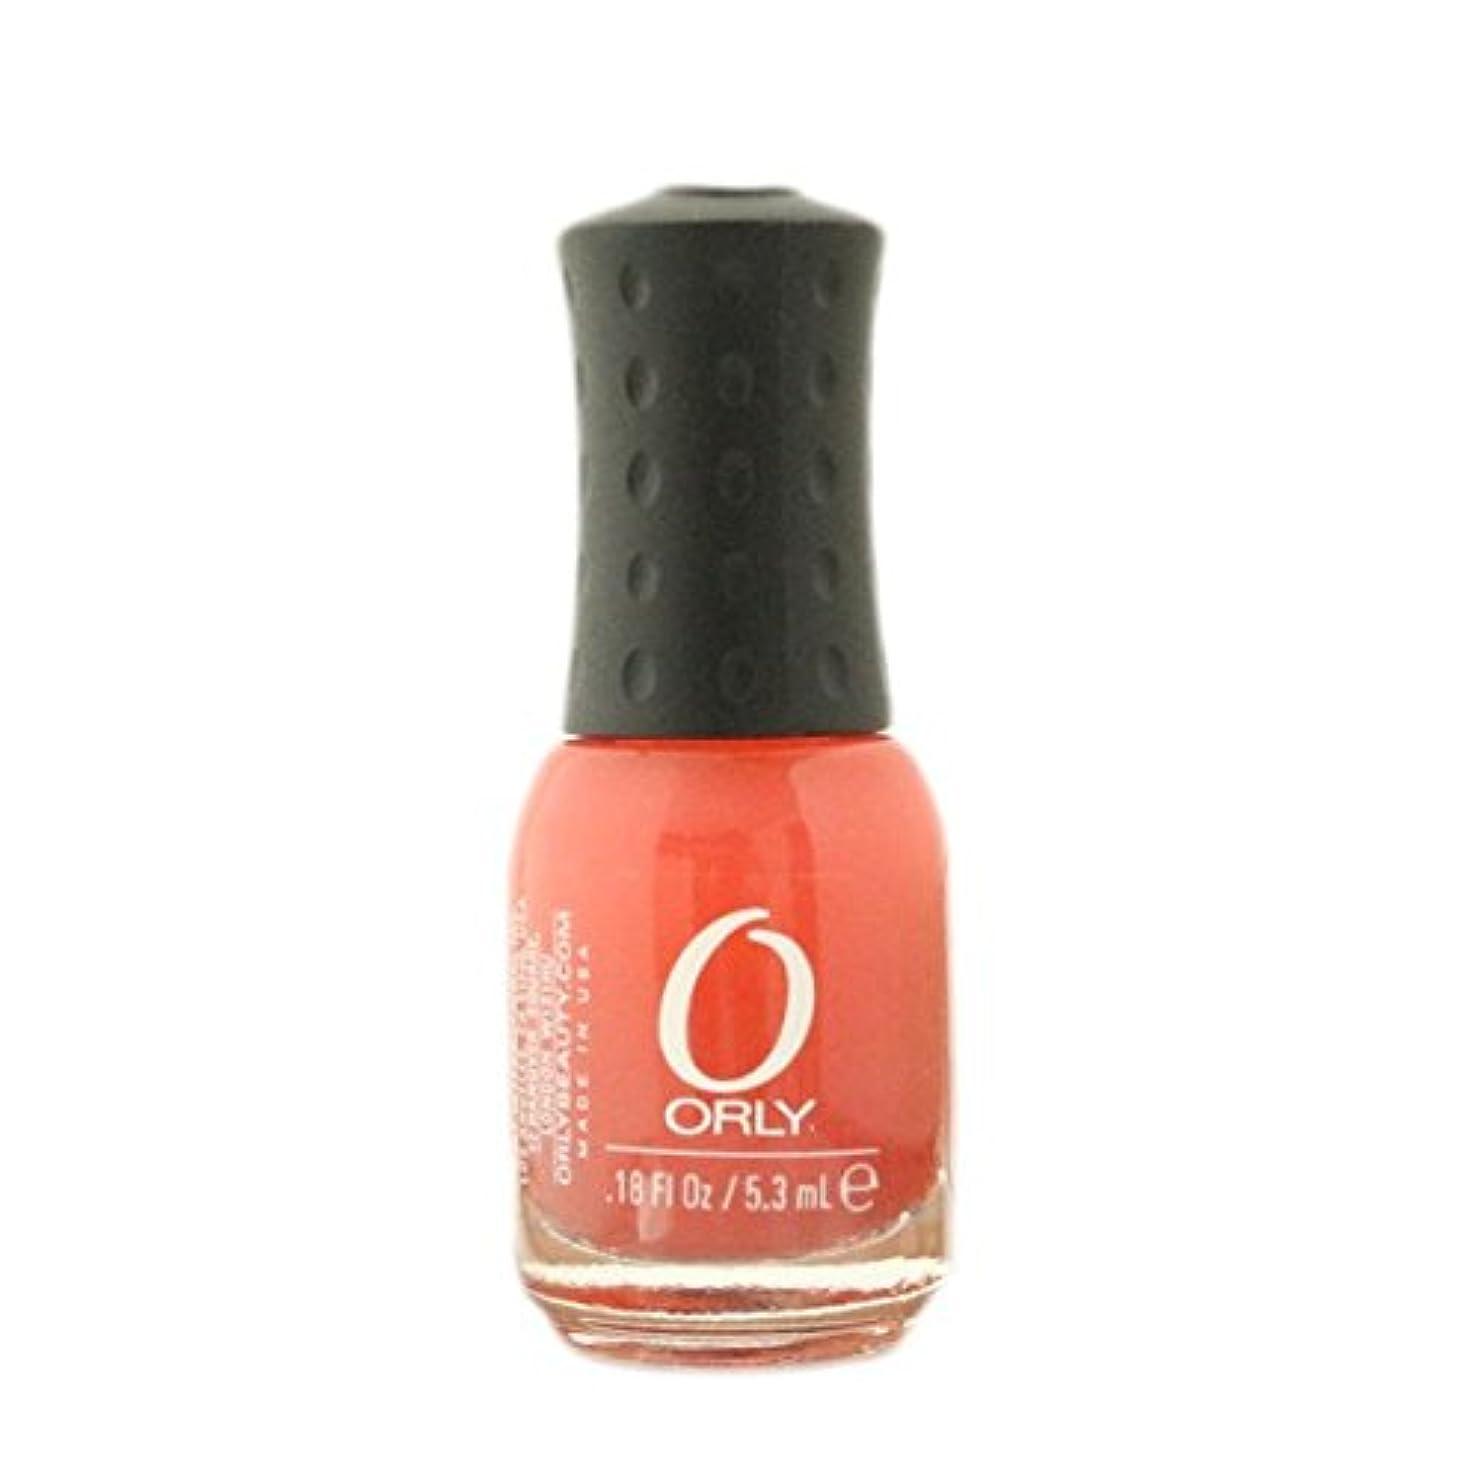 ORLY(オーリー)ネイルラッカーミニ 5.3ml ベアローズ#48205